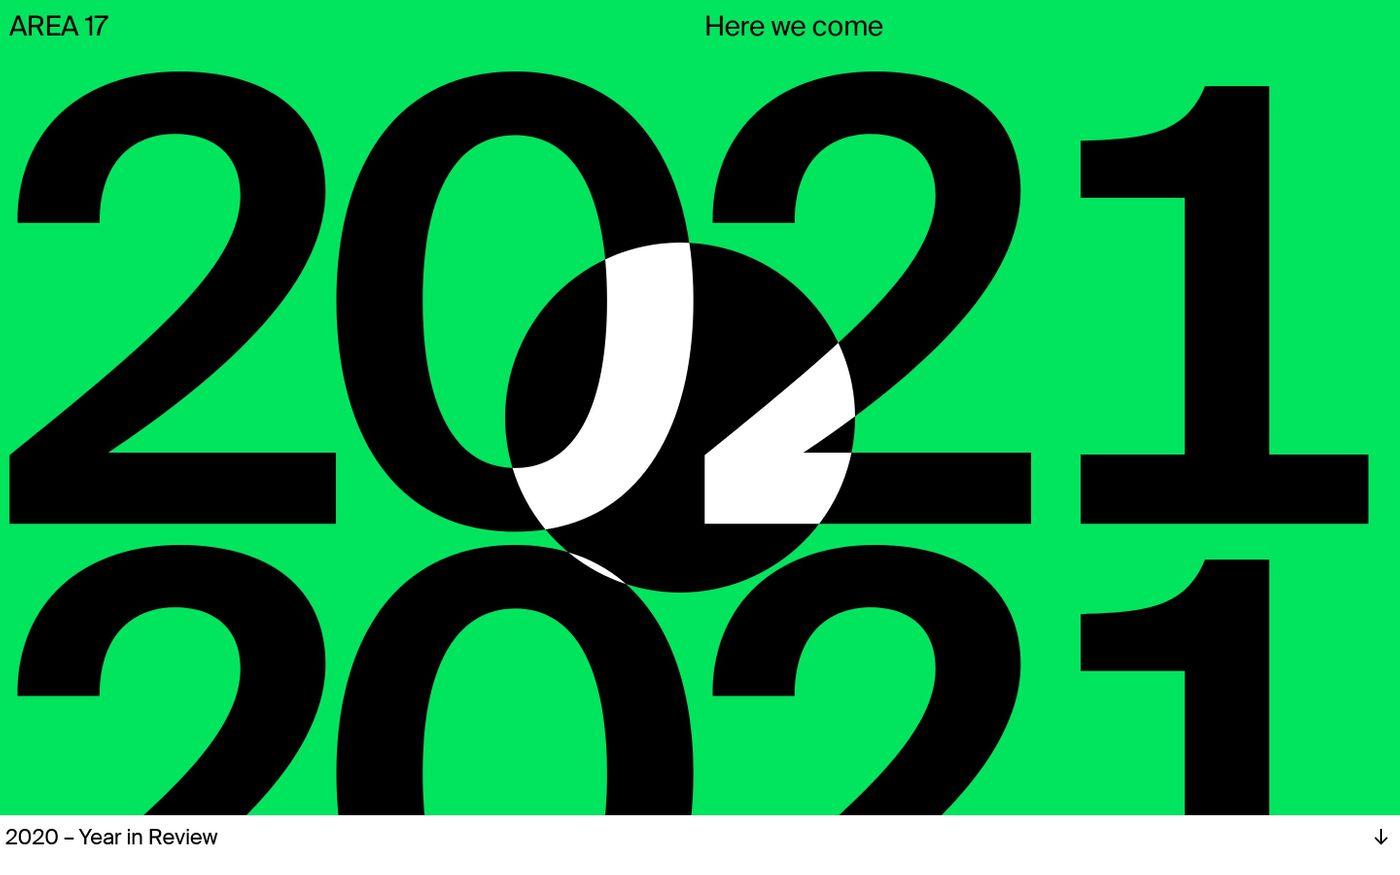 Screenshot of Year in Review 2020 website